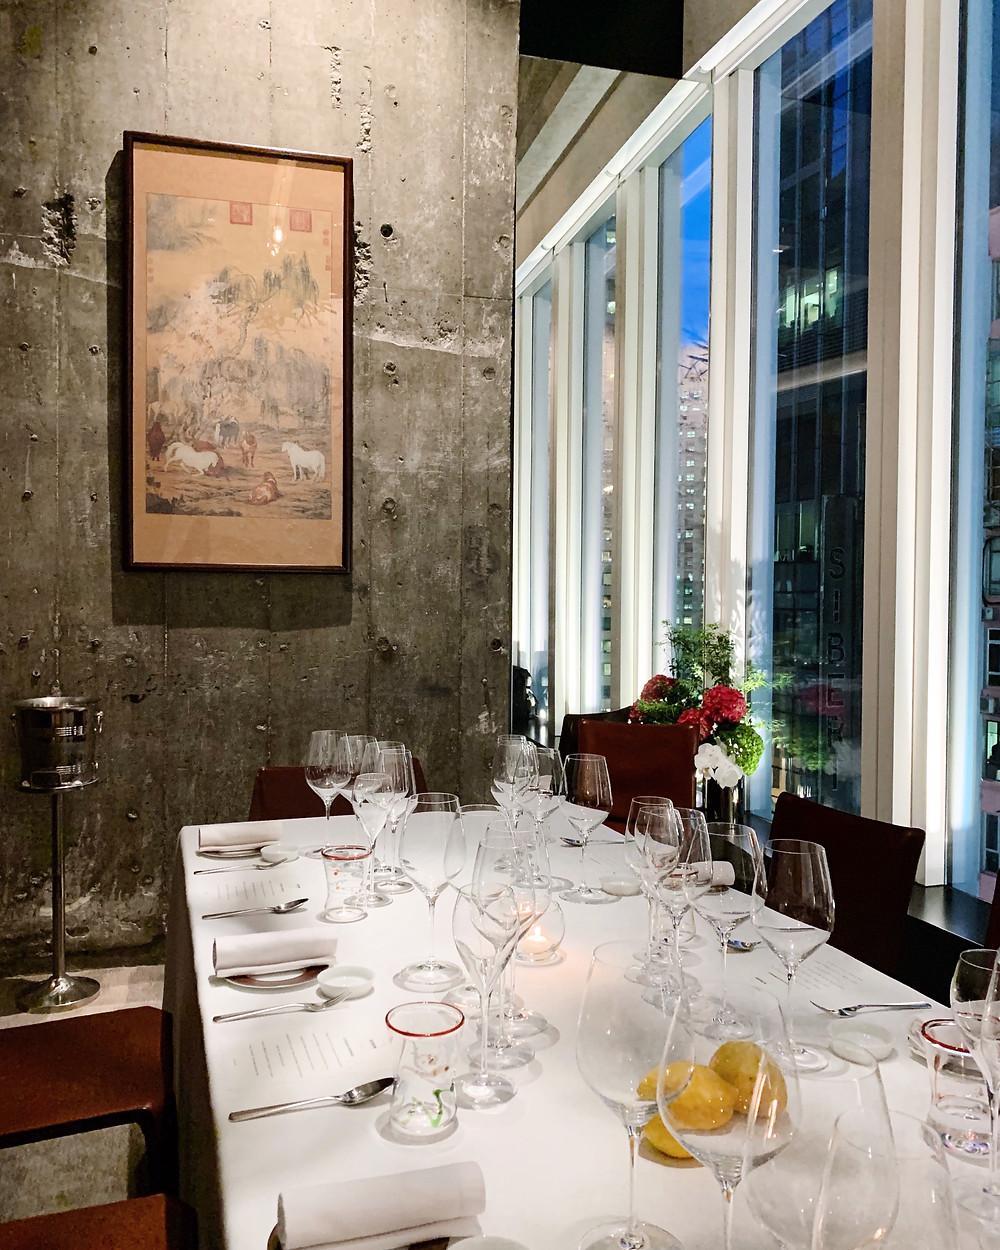 Private room at Octavium Italian restaurant in Hong Kong